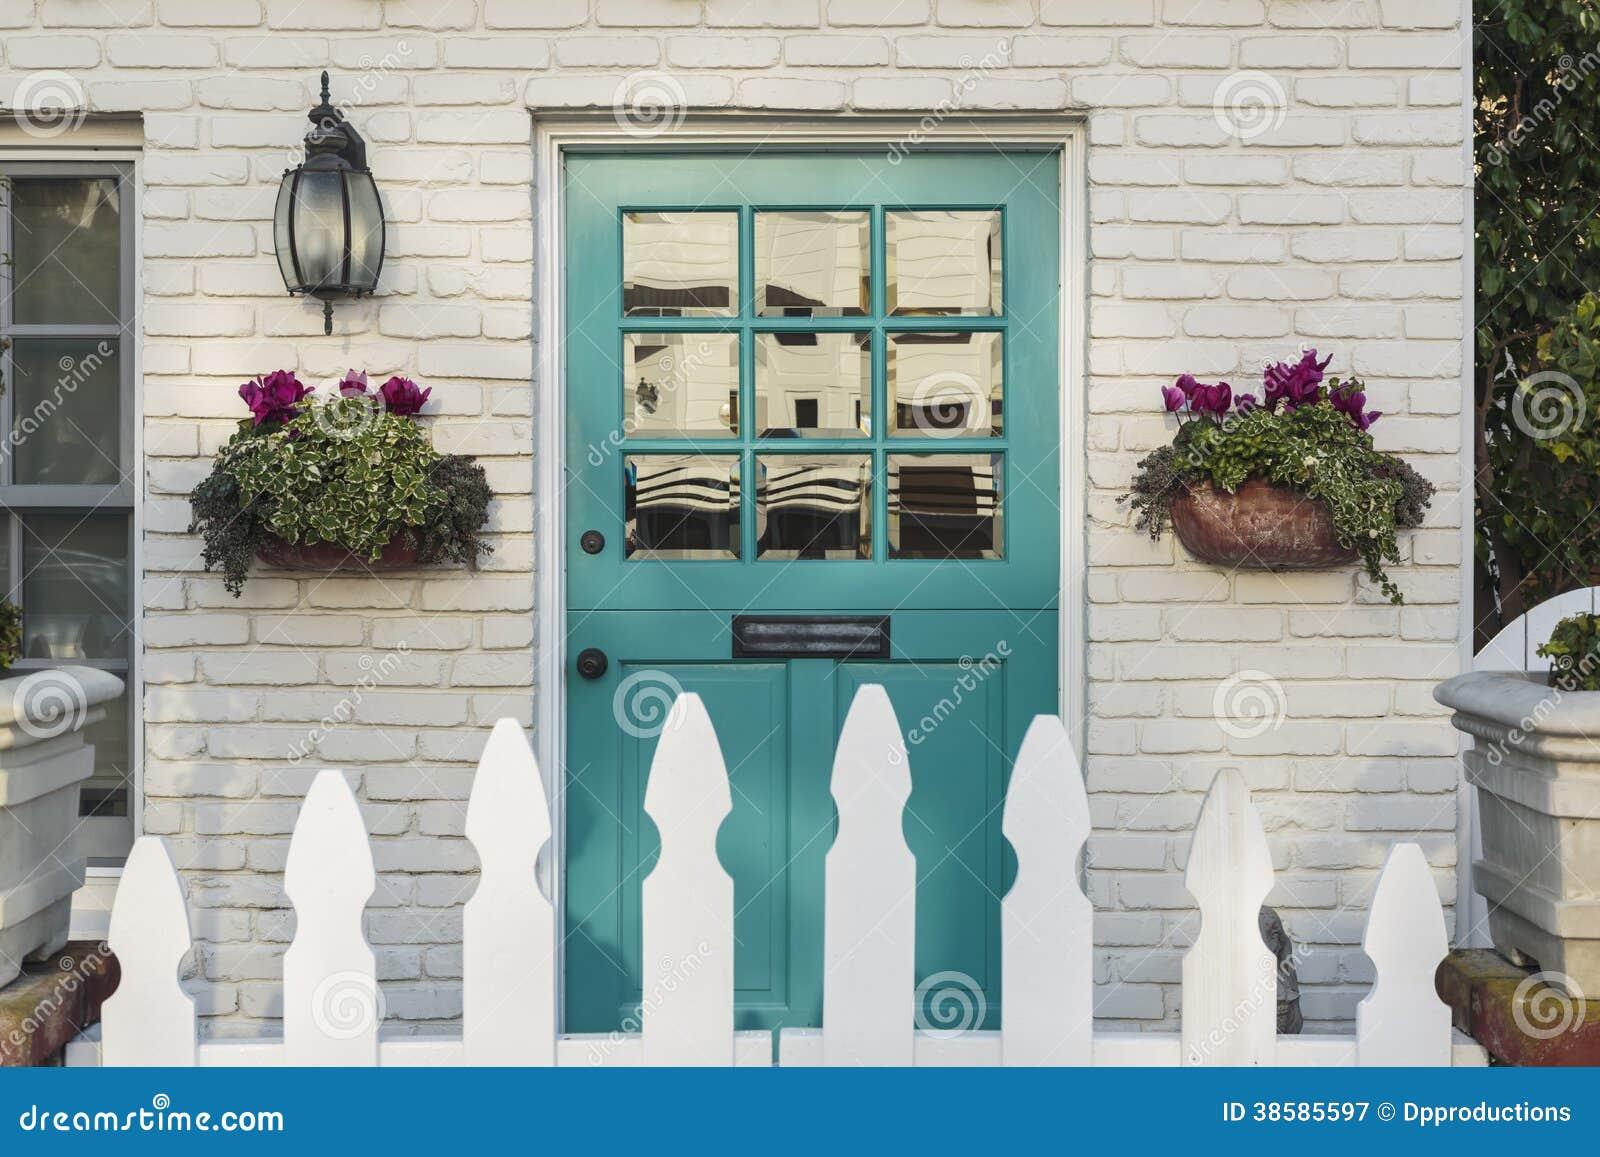 Teal front door of a classic home